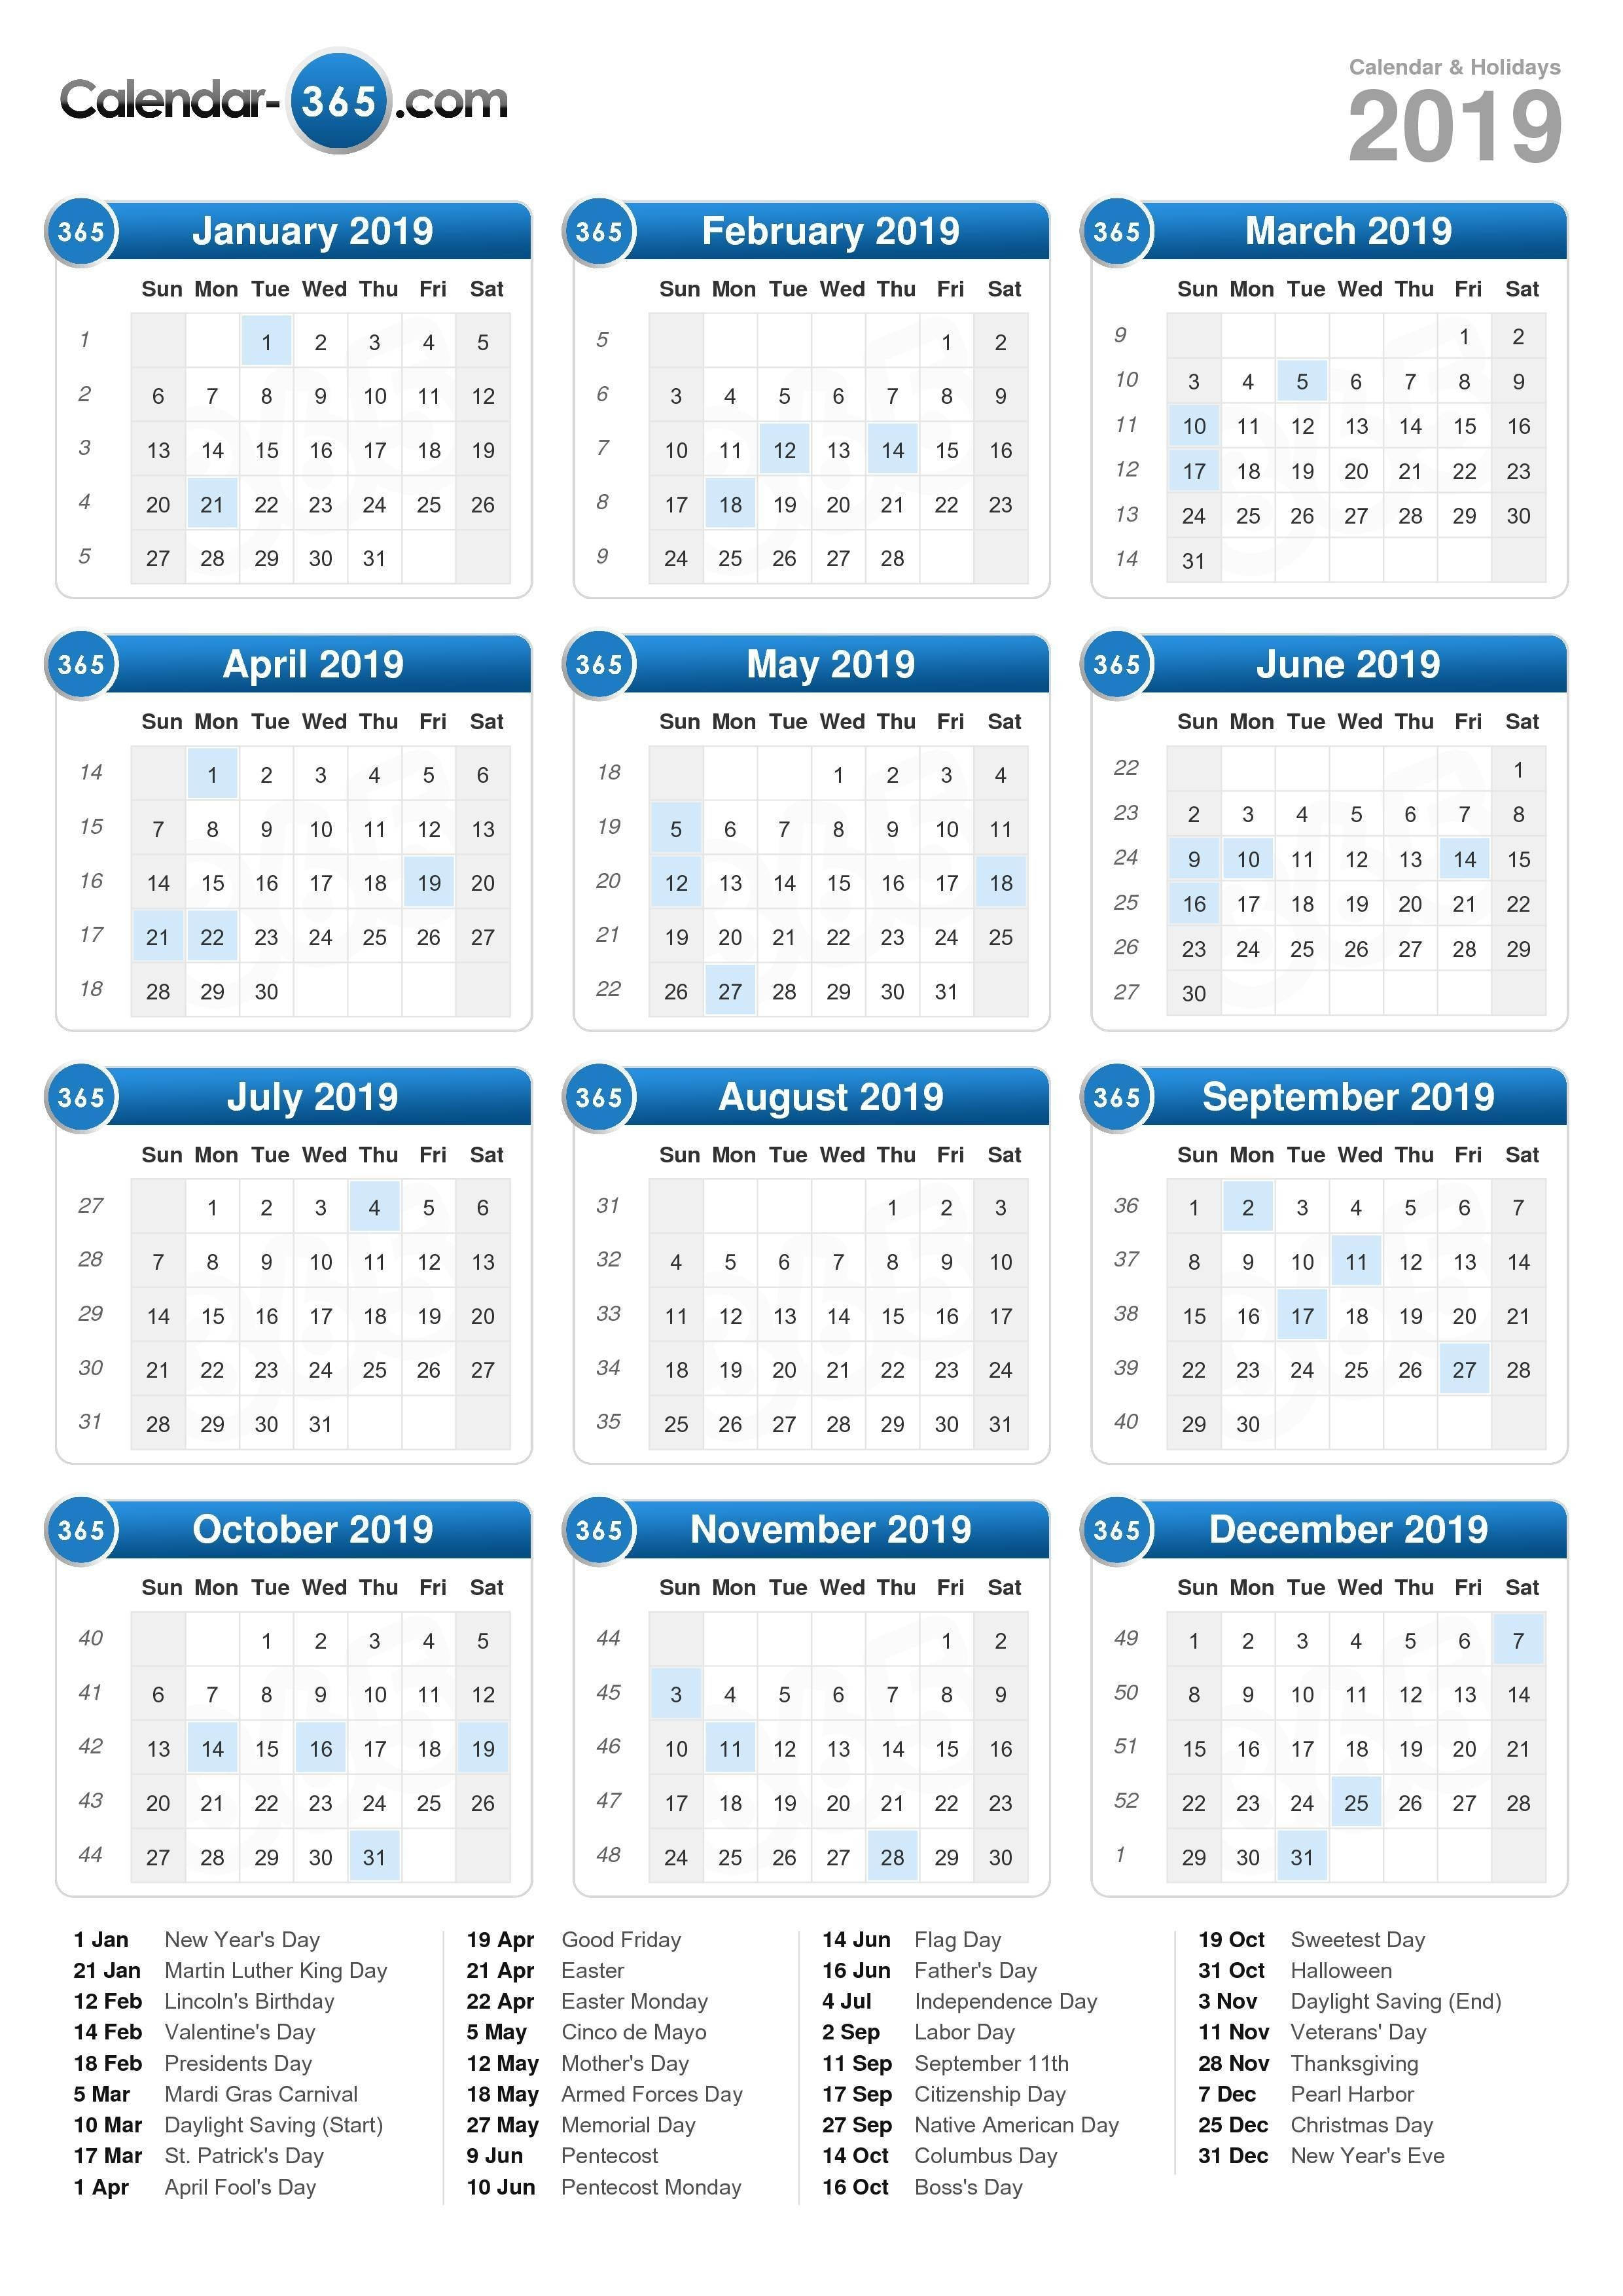 2019 Calendar Calendar 2019 Holiday Dates